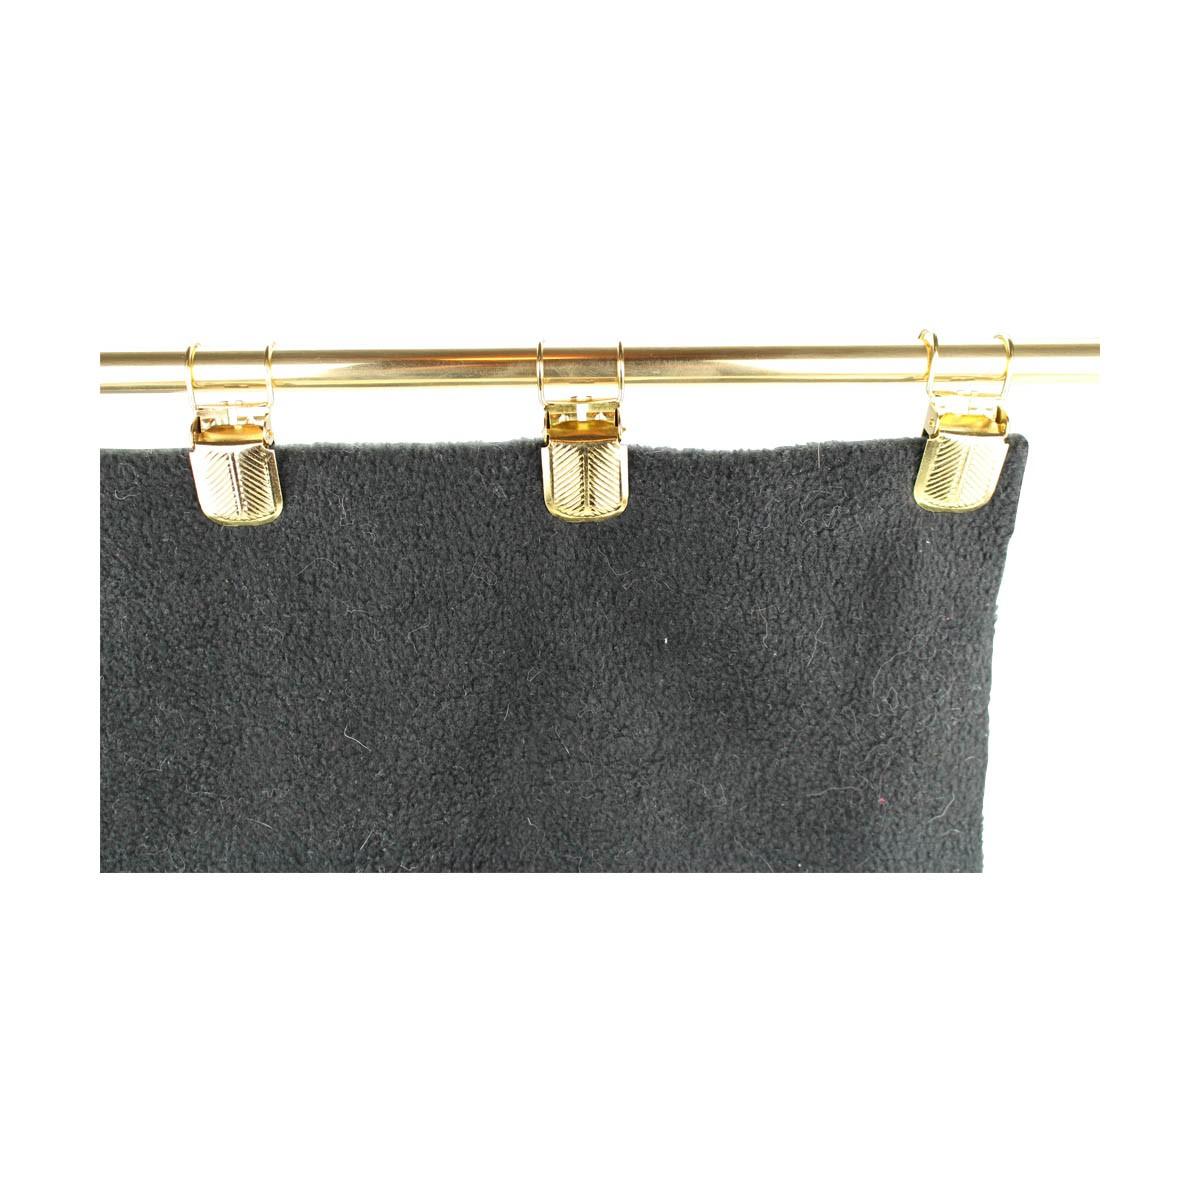 Quilt Hanger Bright Brass 9 Ft Pineapple Finial Quilt Holders Quilt Holder Quilt hanger